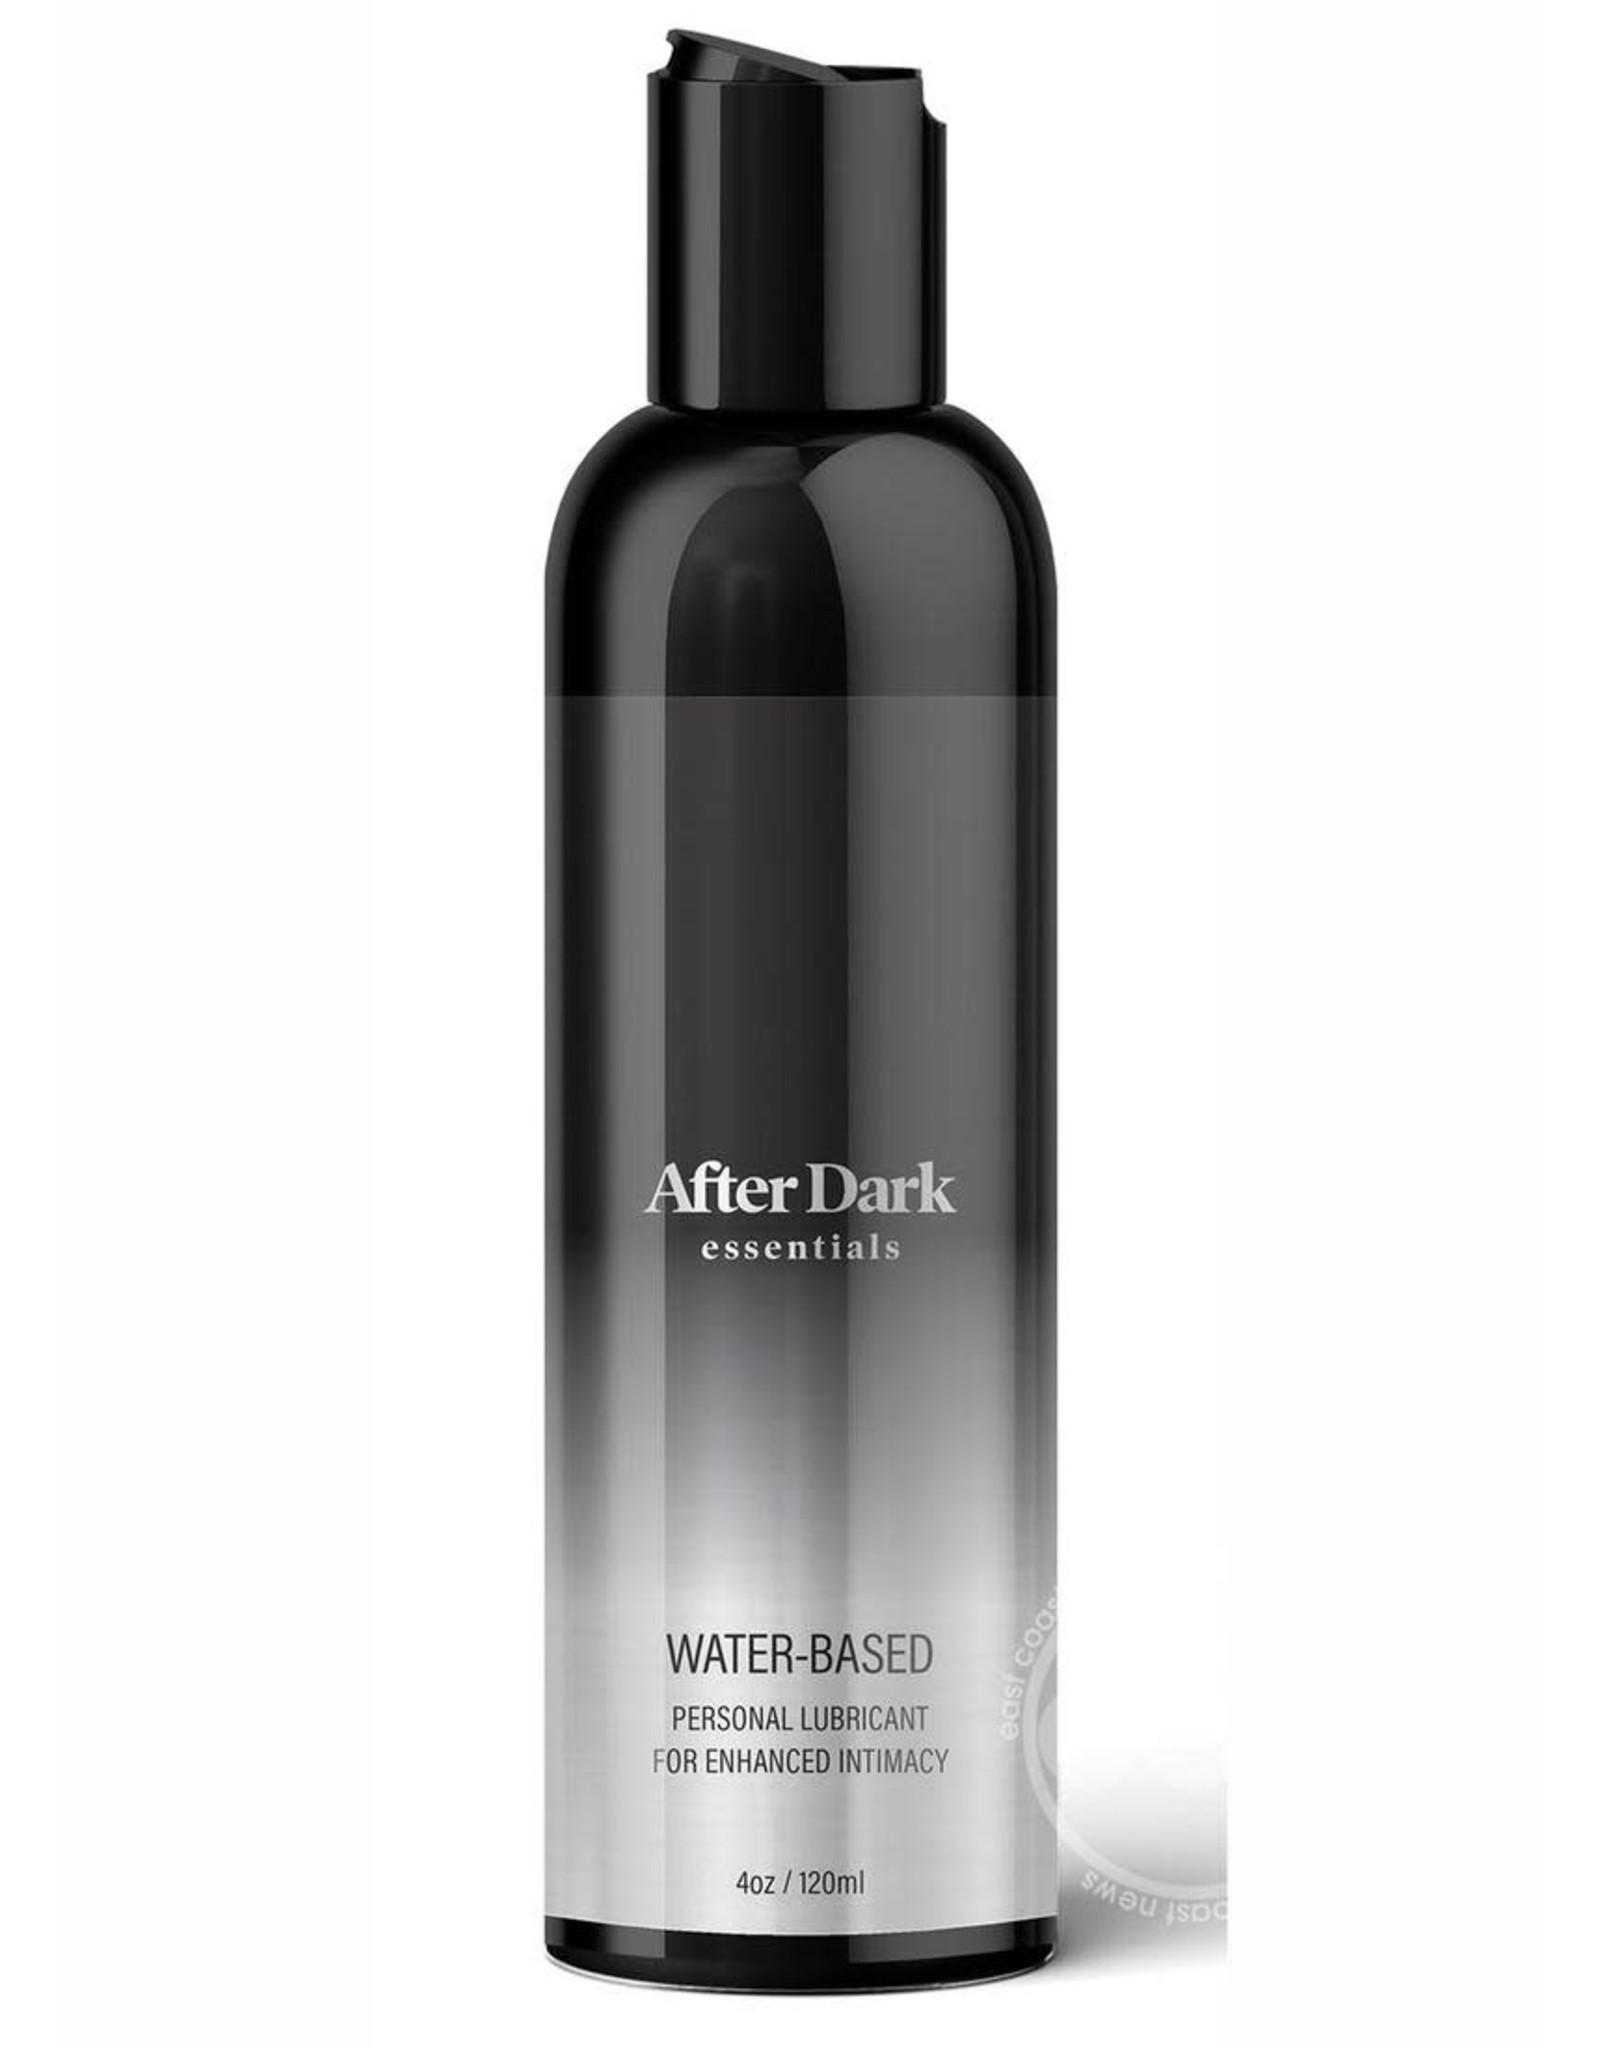 After Dark Essentials After Dark Essentials Water Based Lube